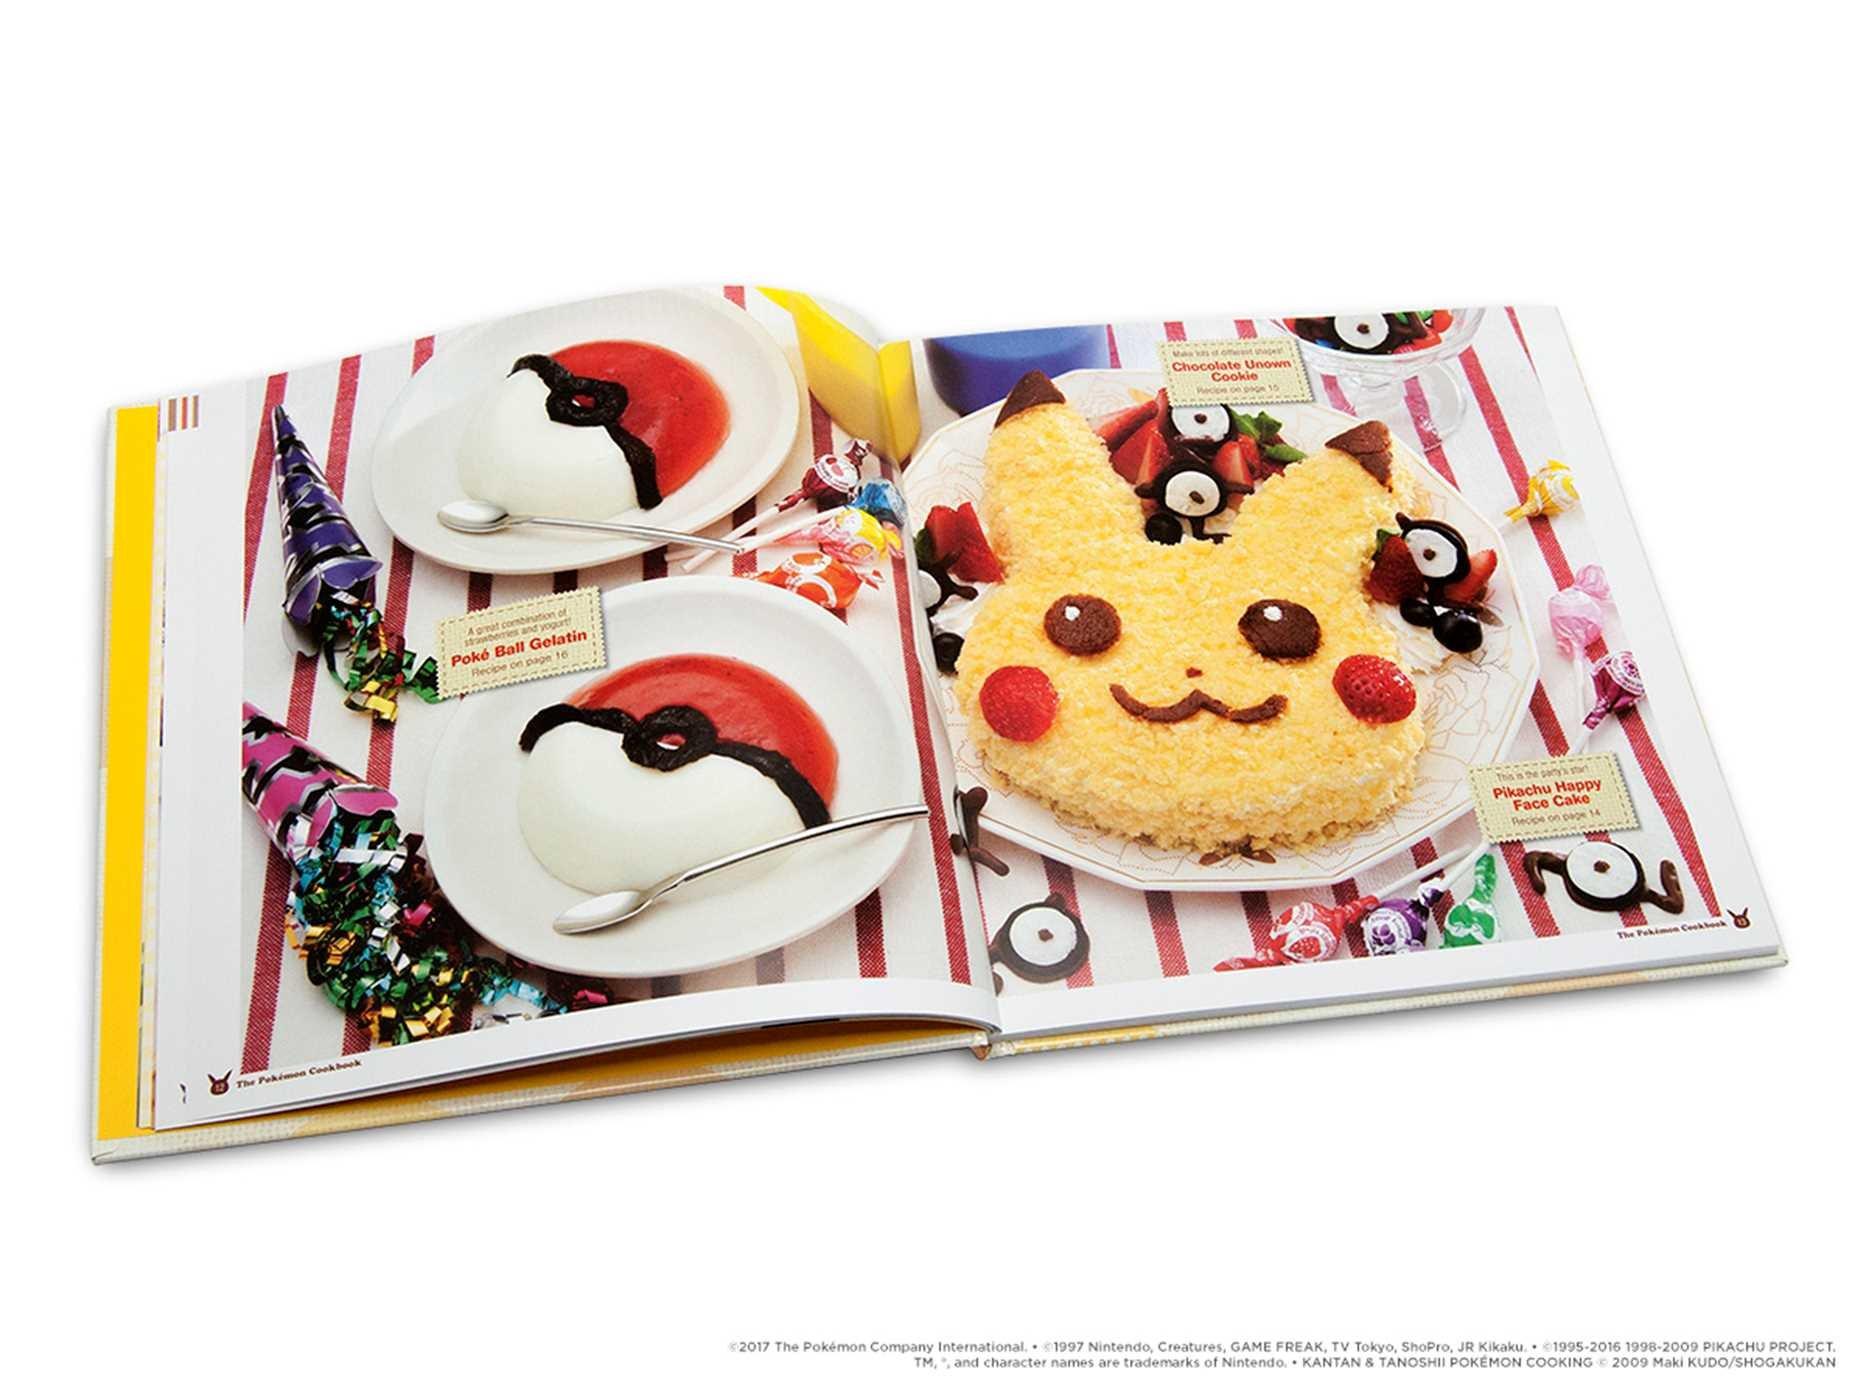 Amazoncom The Pokémon Cookbook Easy Fun Recipes Pokemon